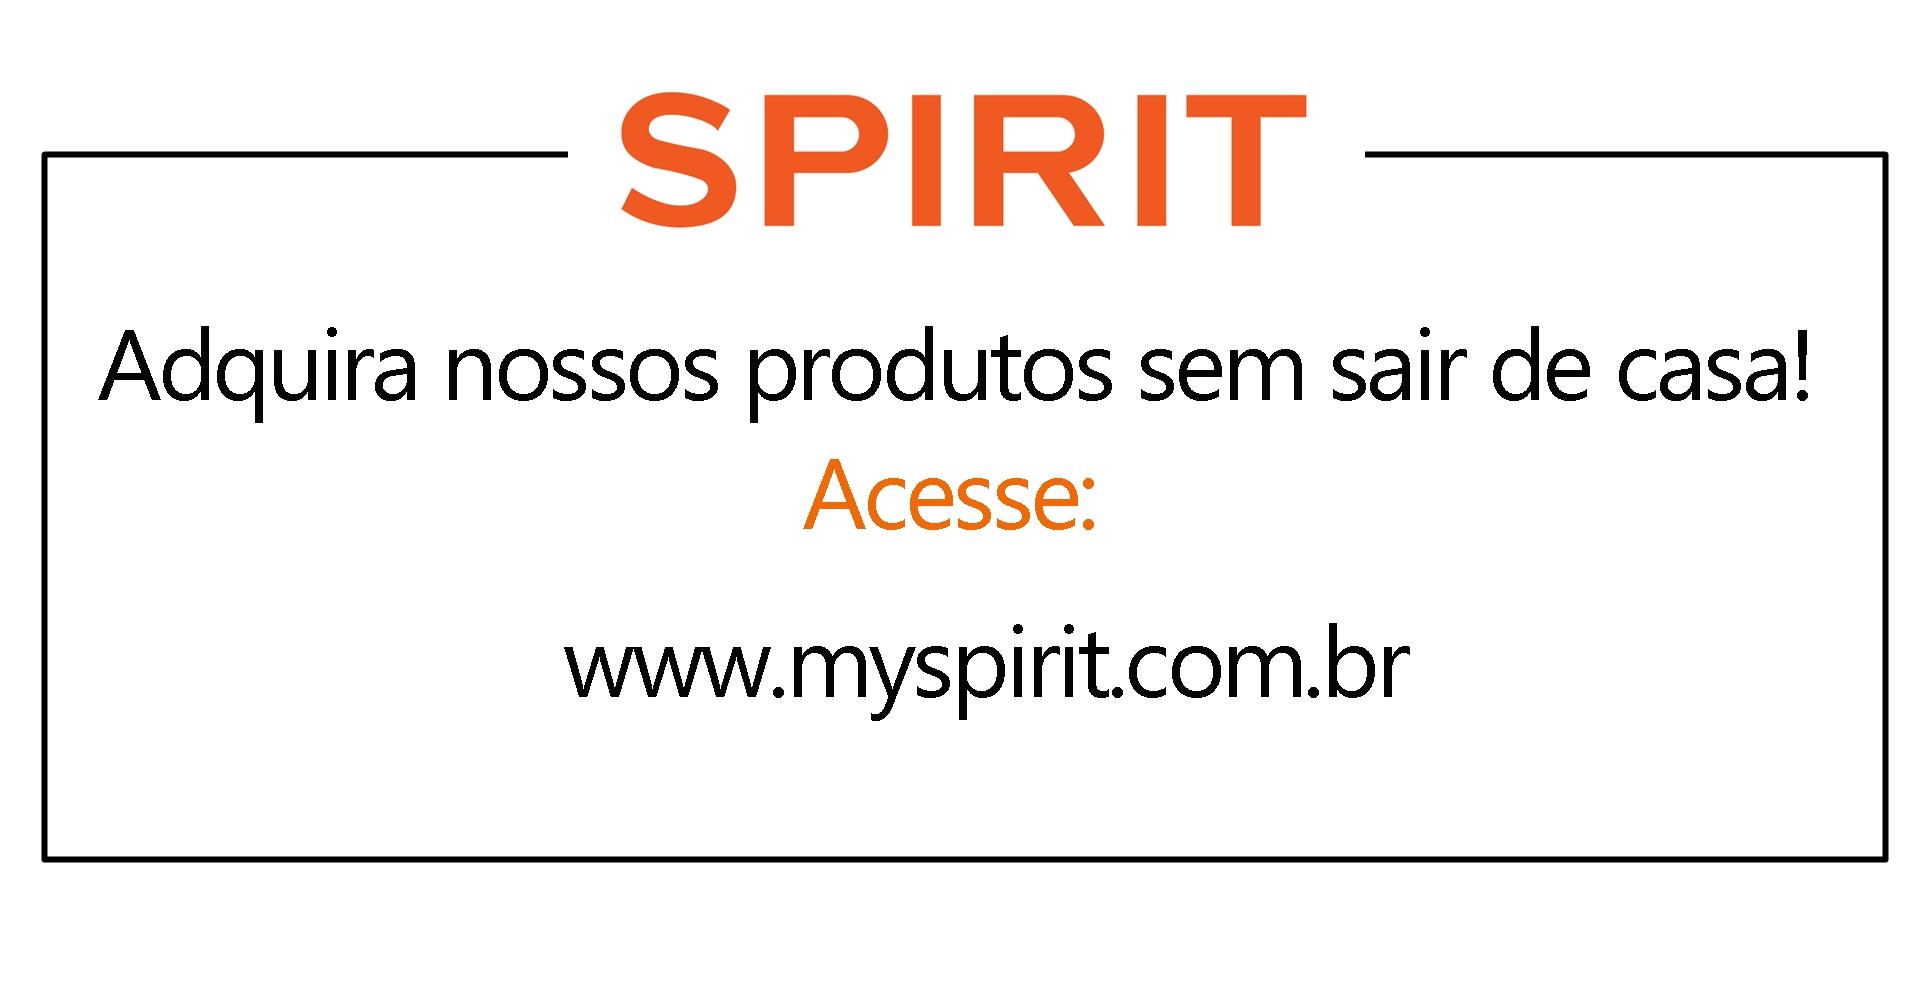 ventilador de teto Spirit - Blog Myspirit - banner site Spirit - como economizar energia